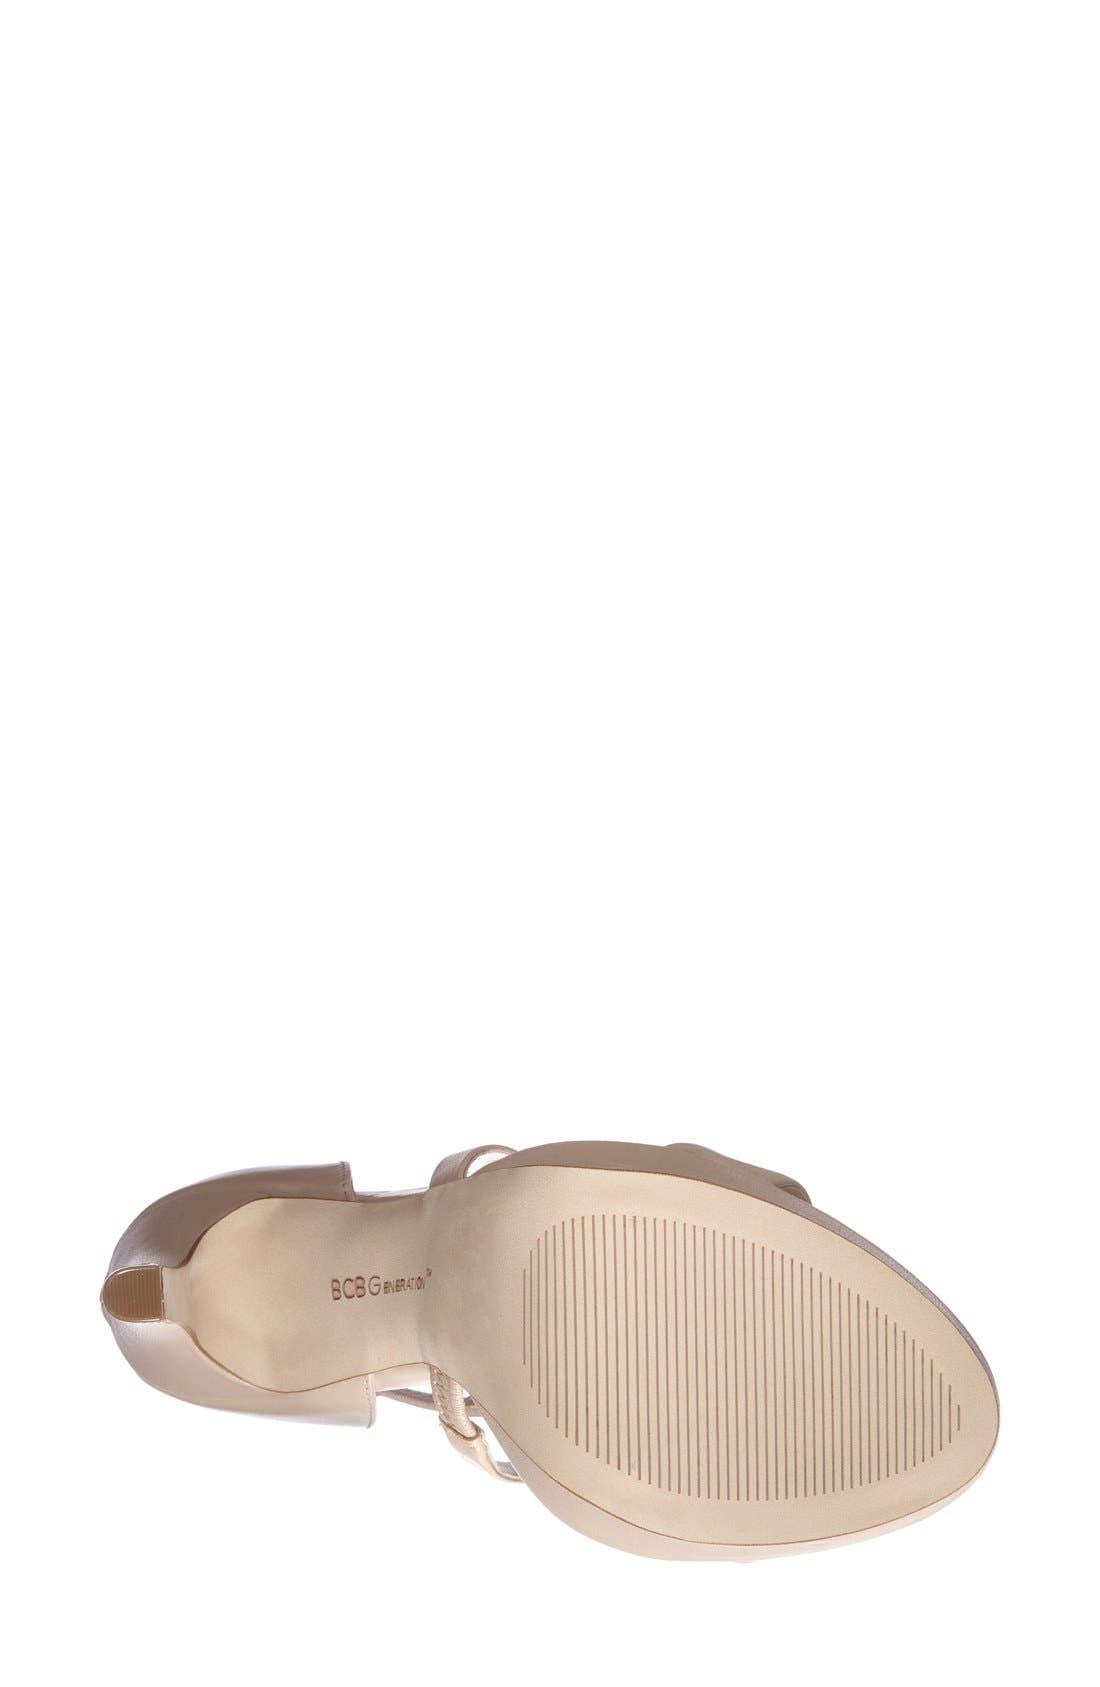 Alternate Image 4  - BCBGeneration 'Gidget' Leather Platform Sandal (Women)